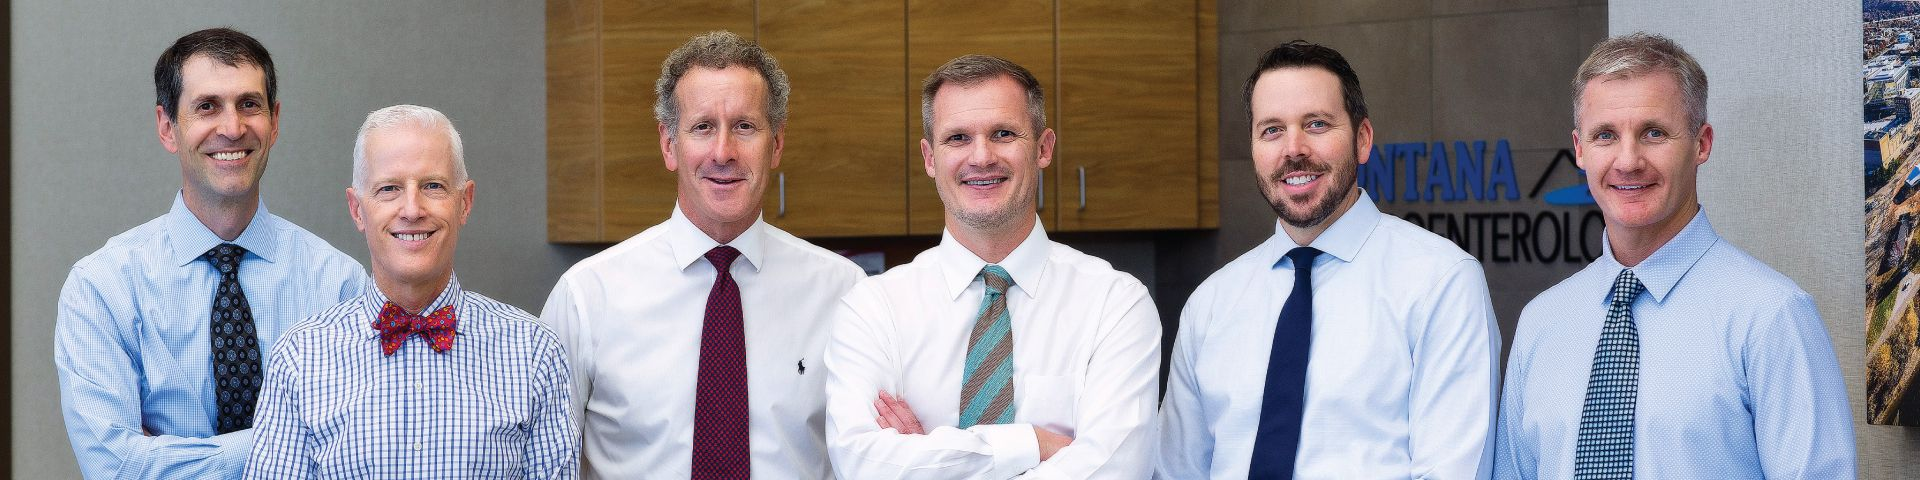 Montana Gastroenterology Doctors